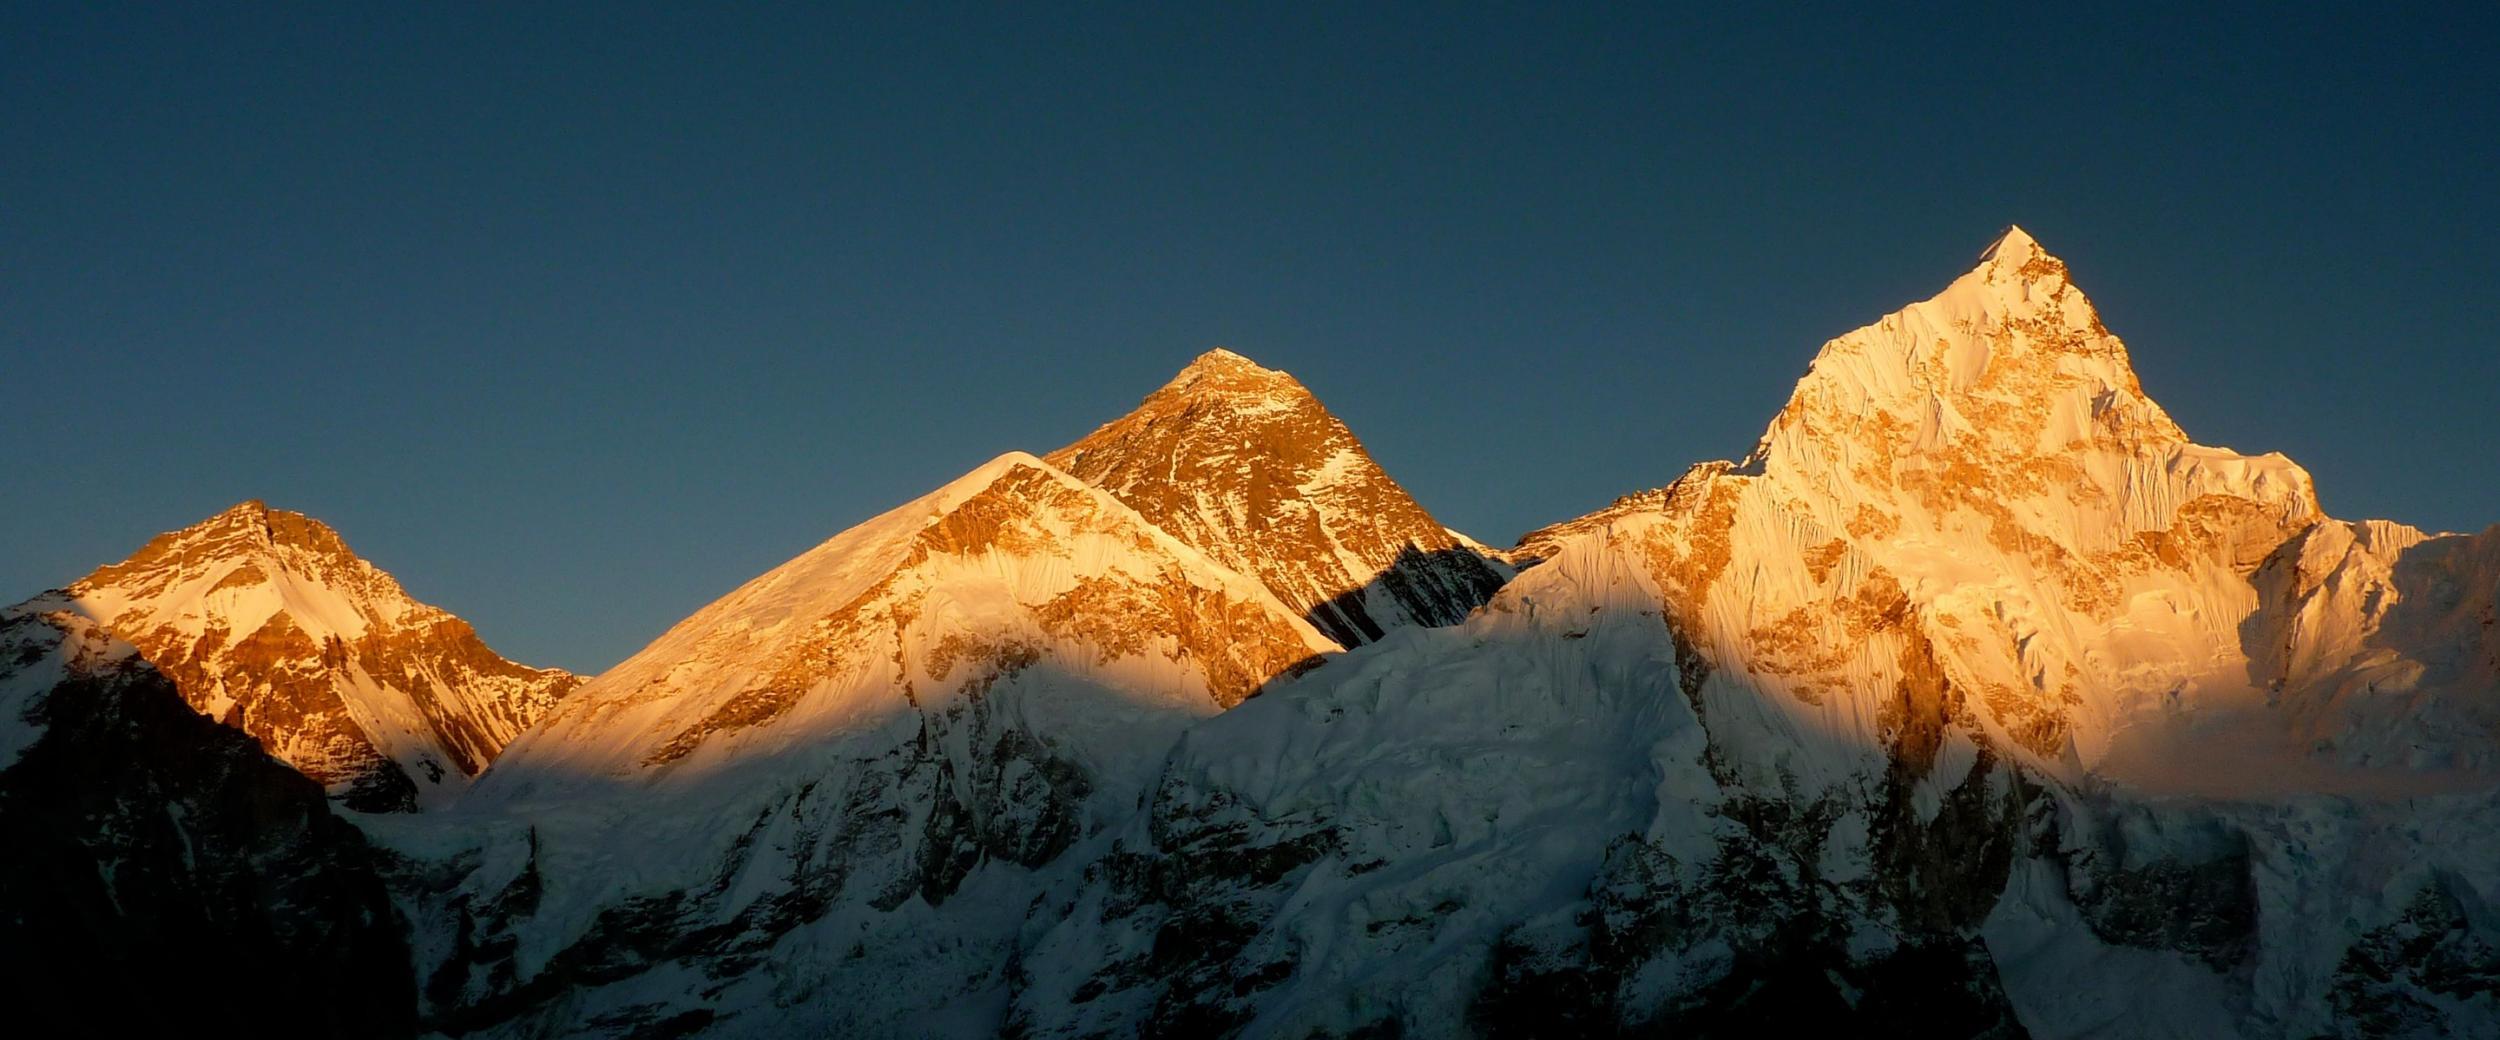 IFMGA, Nepal National Mountain Guide Association, Mount Everest, Photo by Dominik Meyer